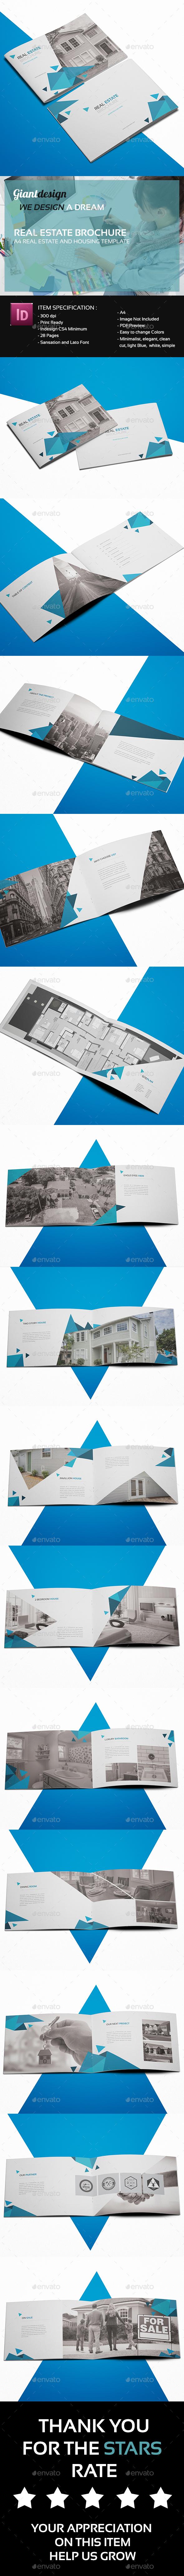 Real Estate Brochure - Corporate Brochures